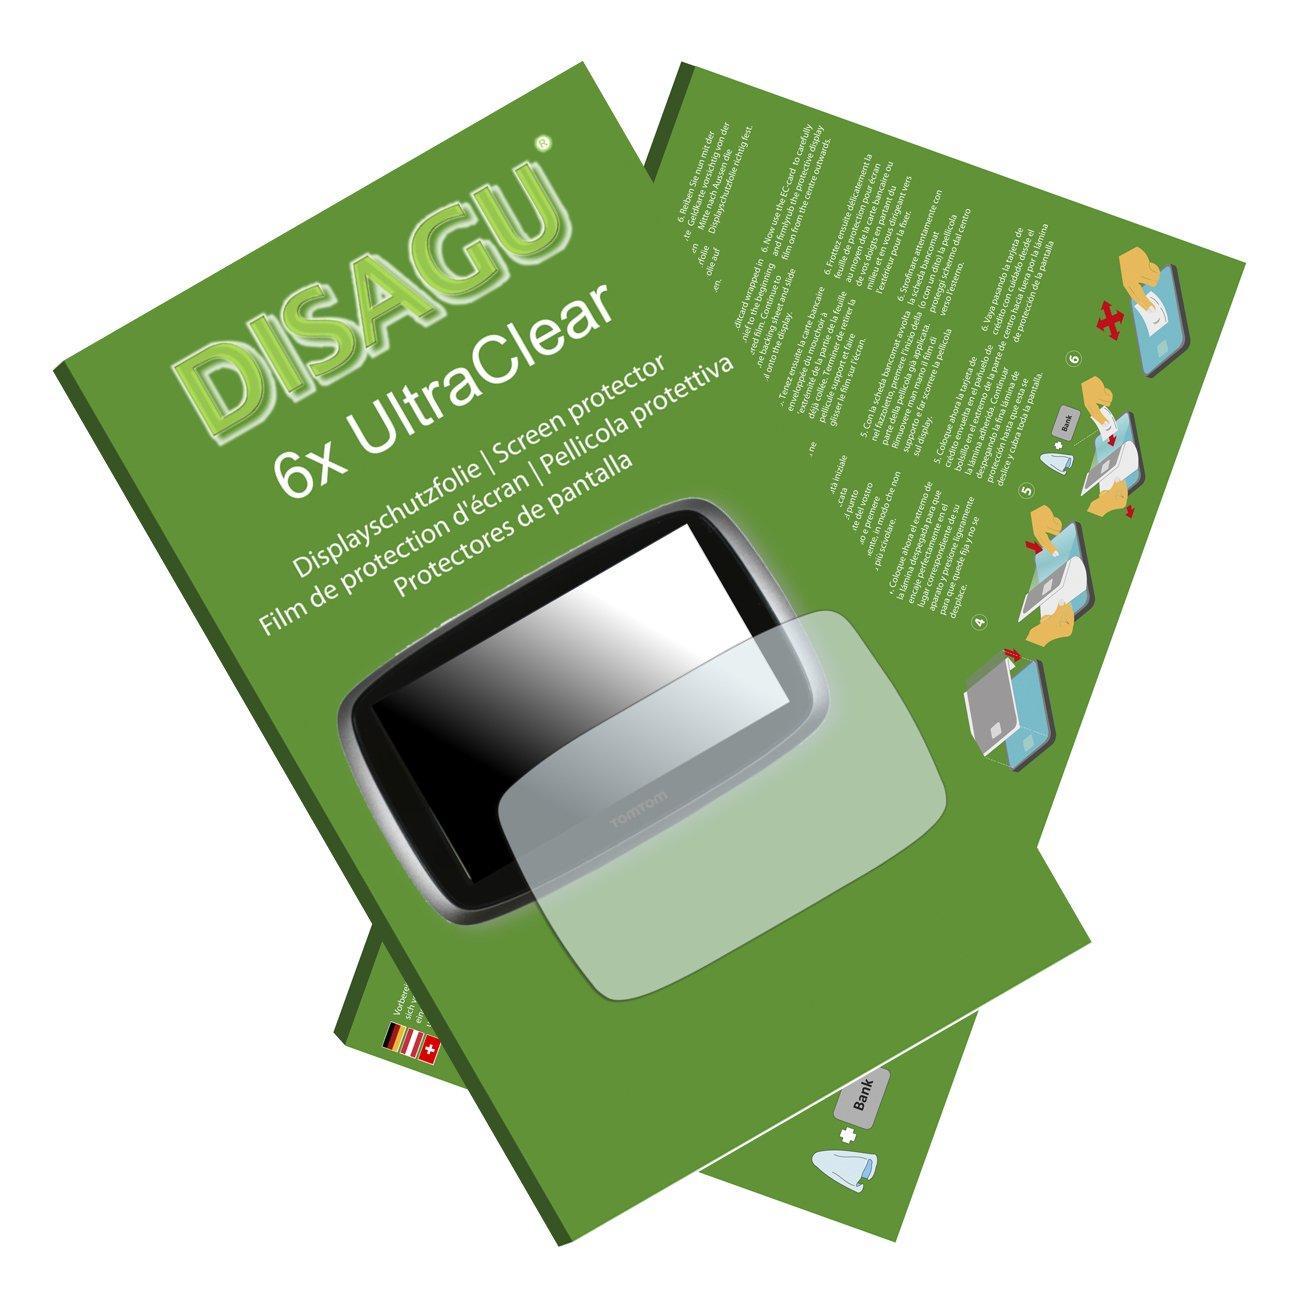 Amazon.com: DISAGU 6X Ultra Clear Screen Protector for ...